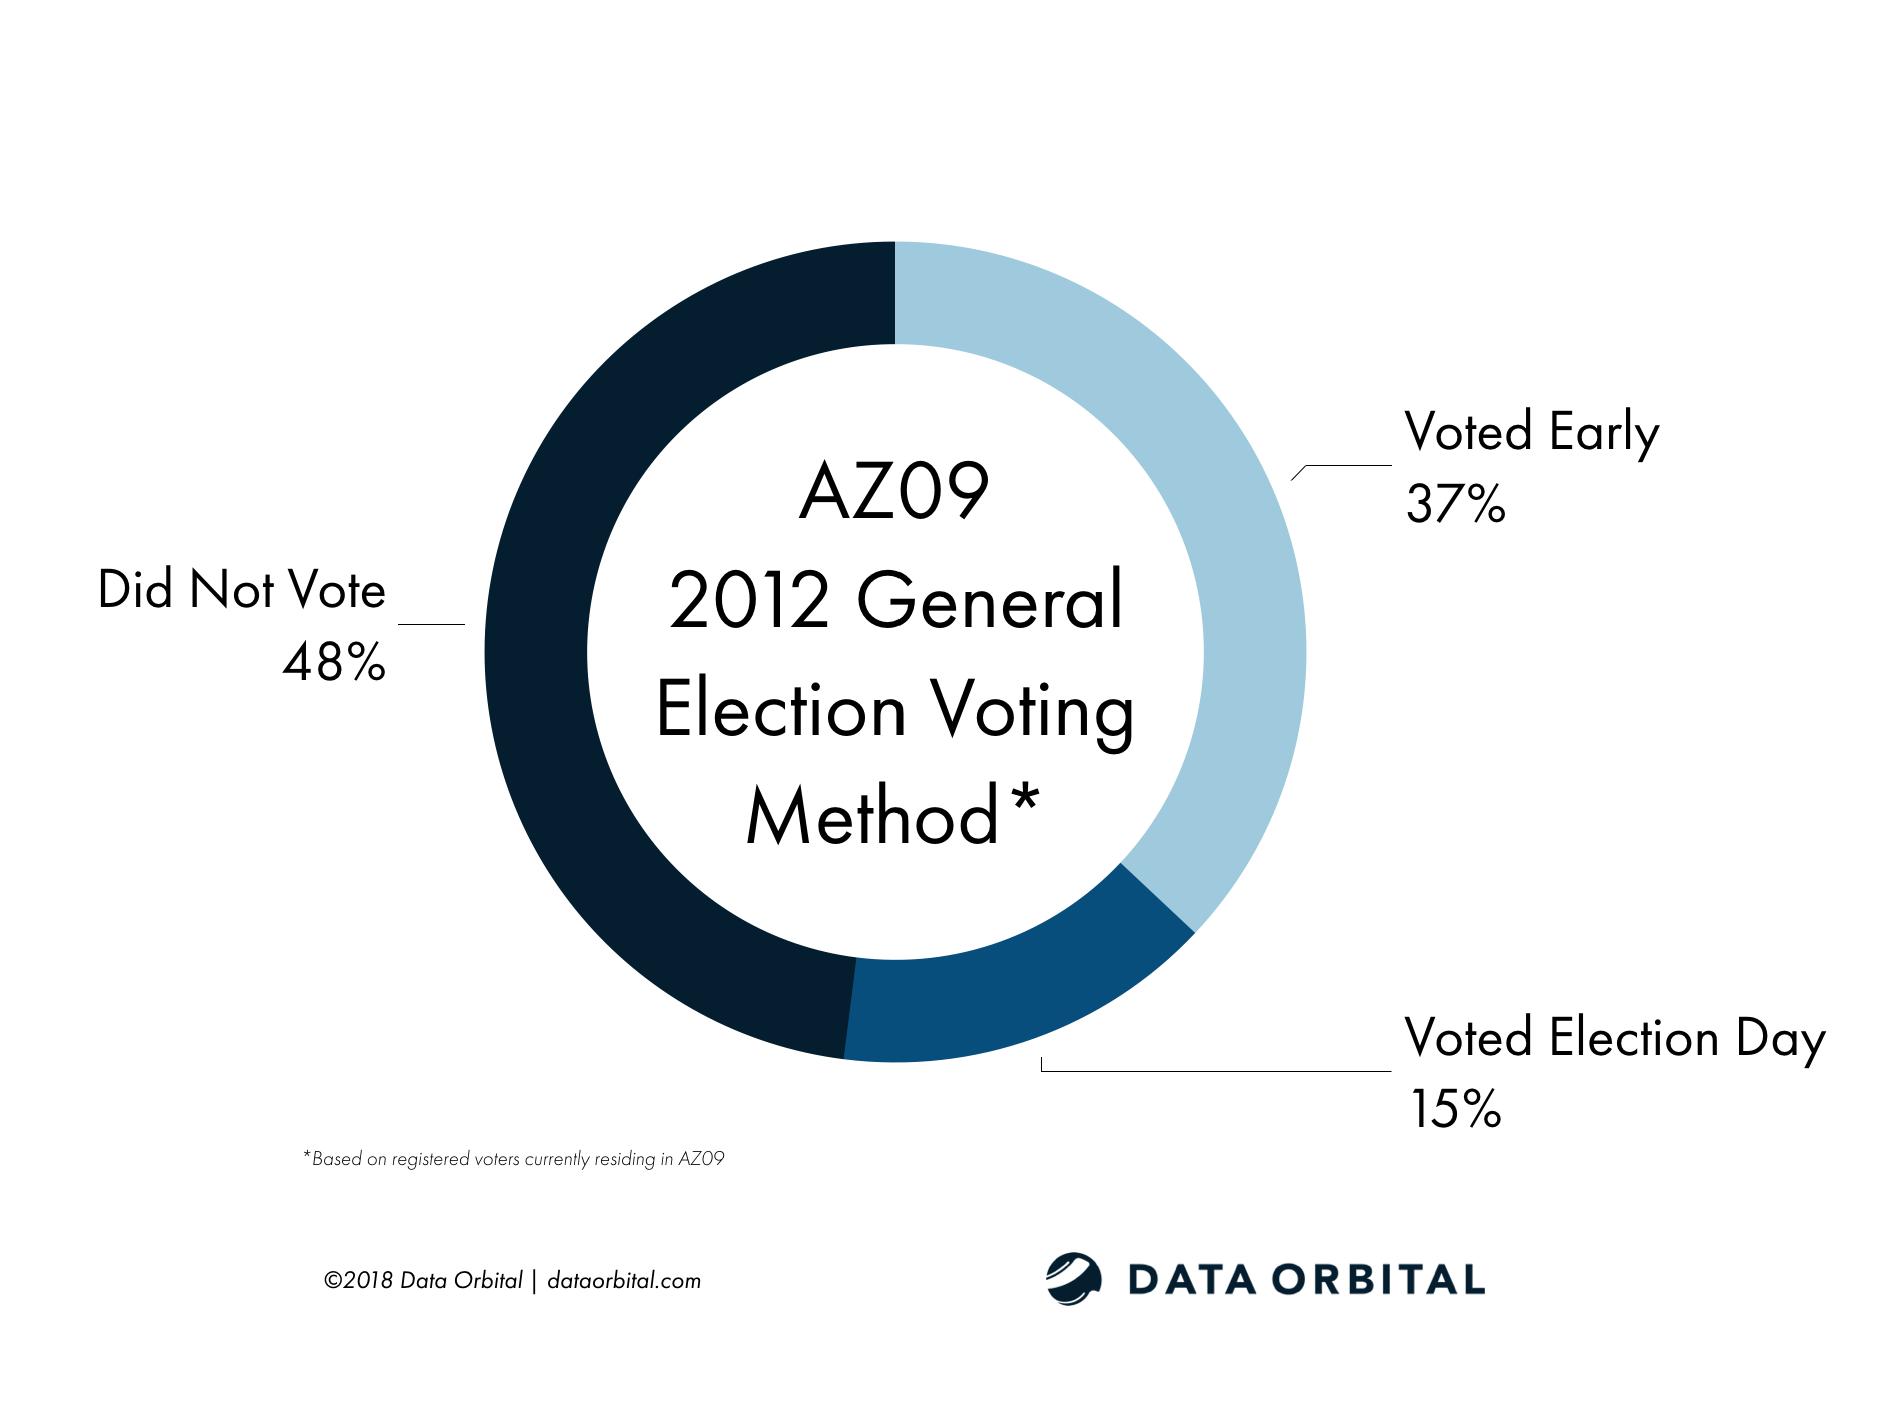 AZ09 District Profile 2012 General Election Voting Method